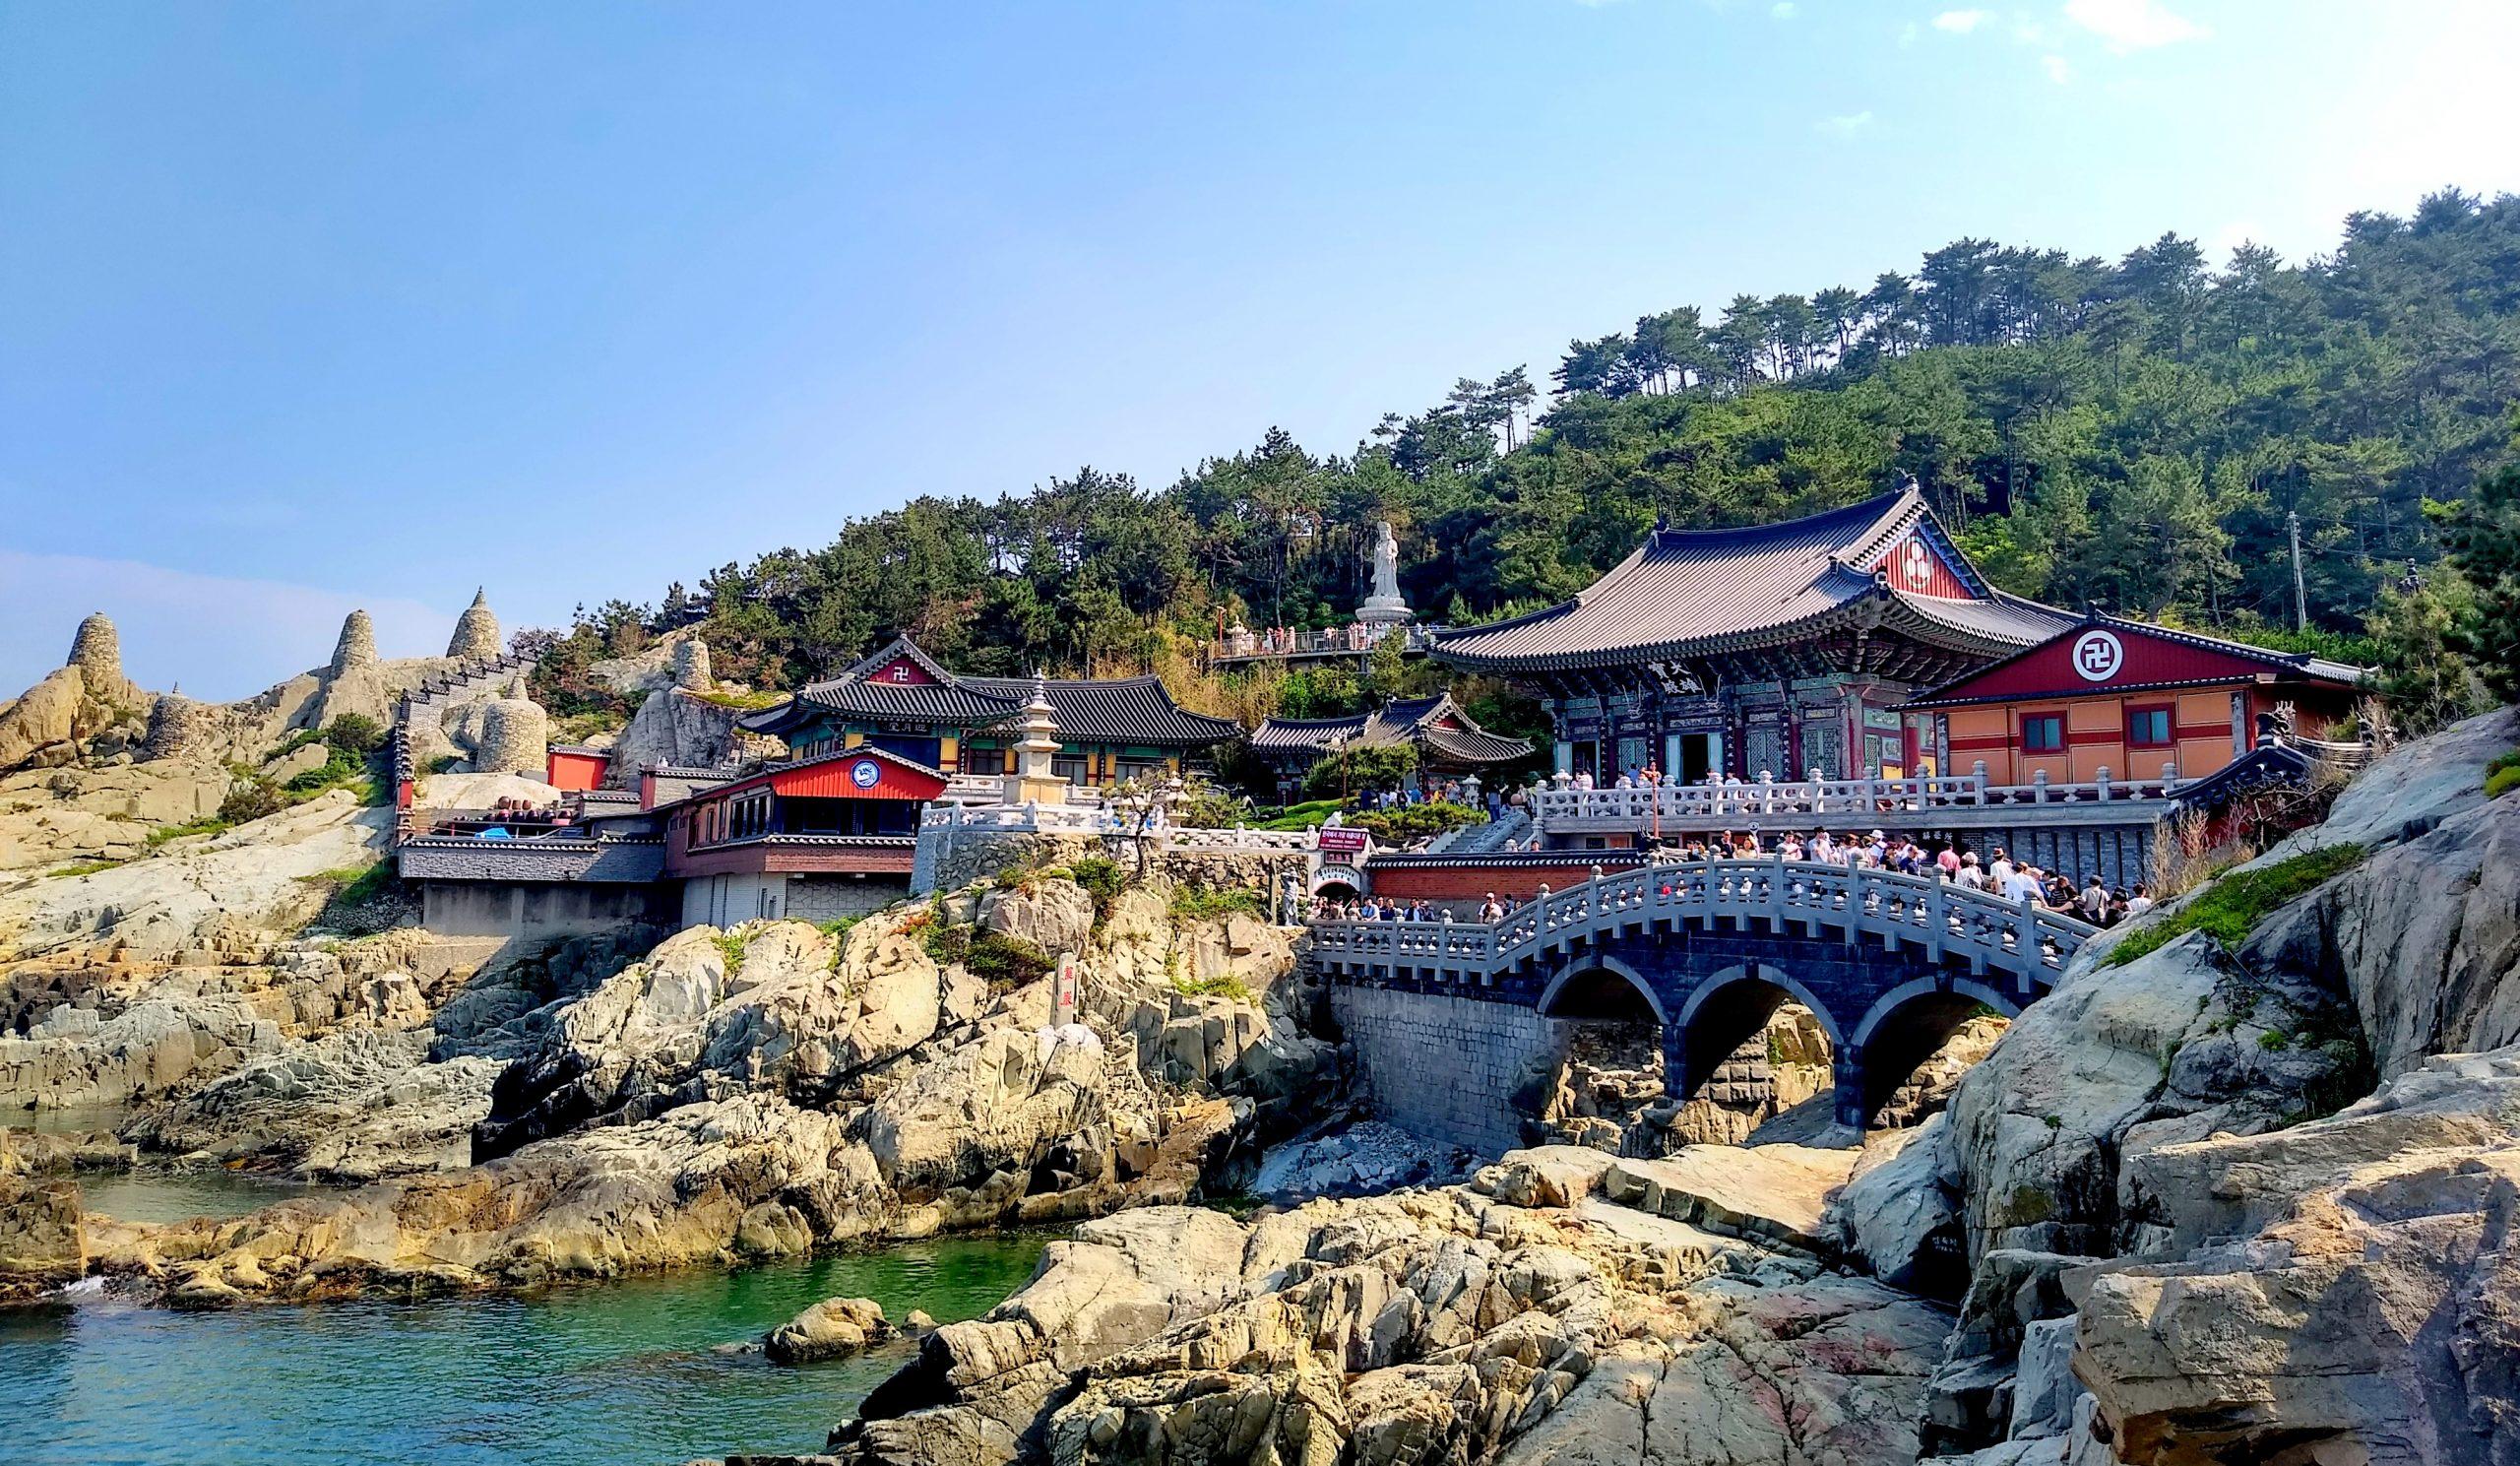 Haedong Yonggungsa Temple in Busan, South Korea